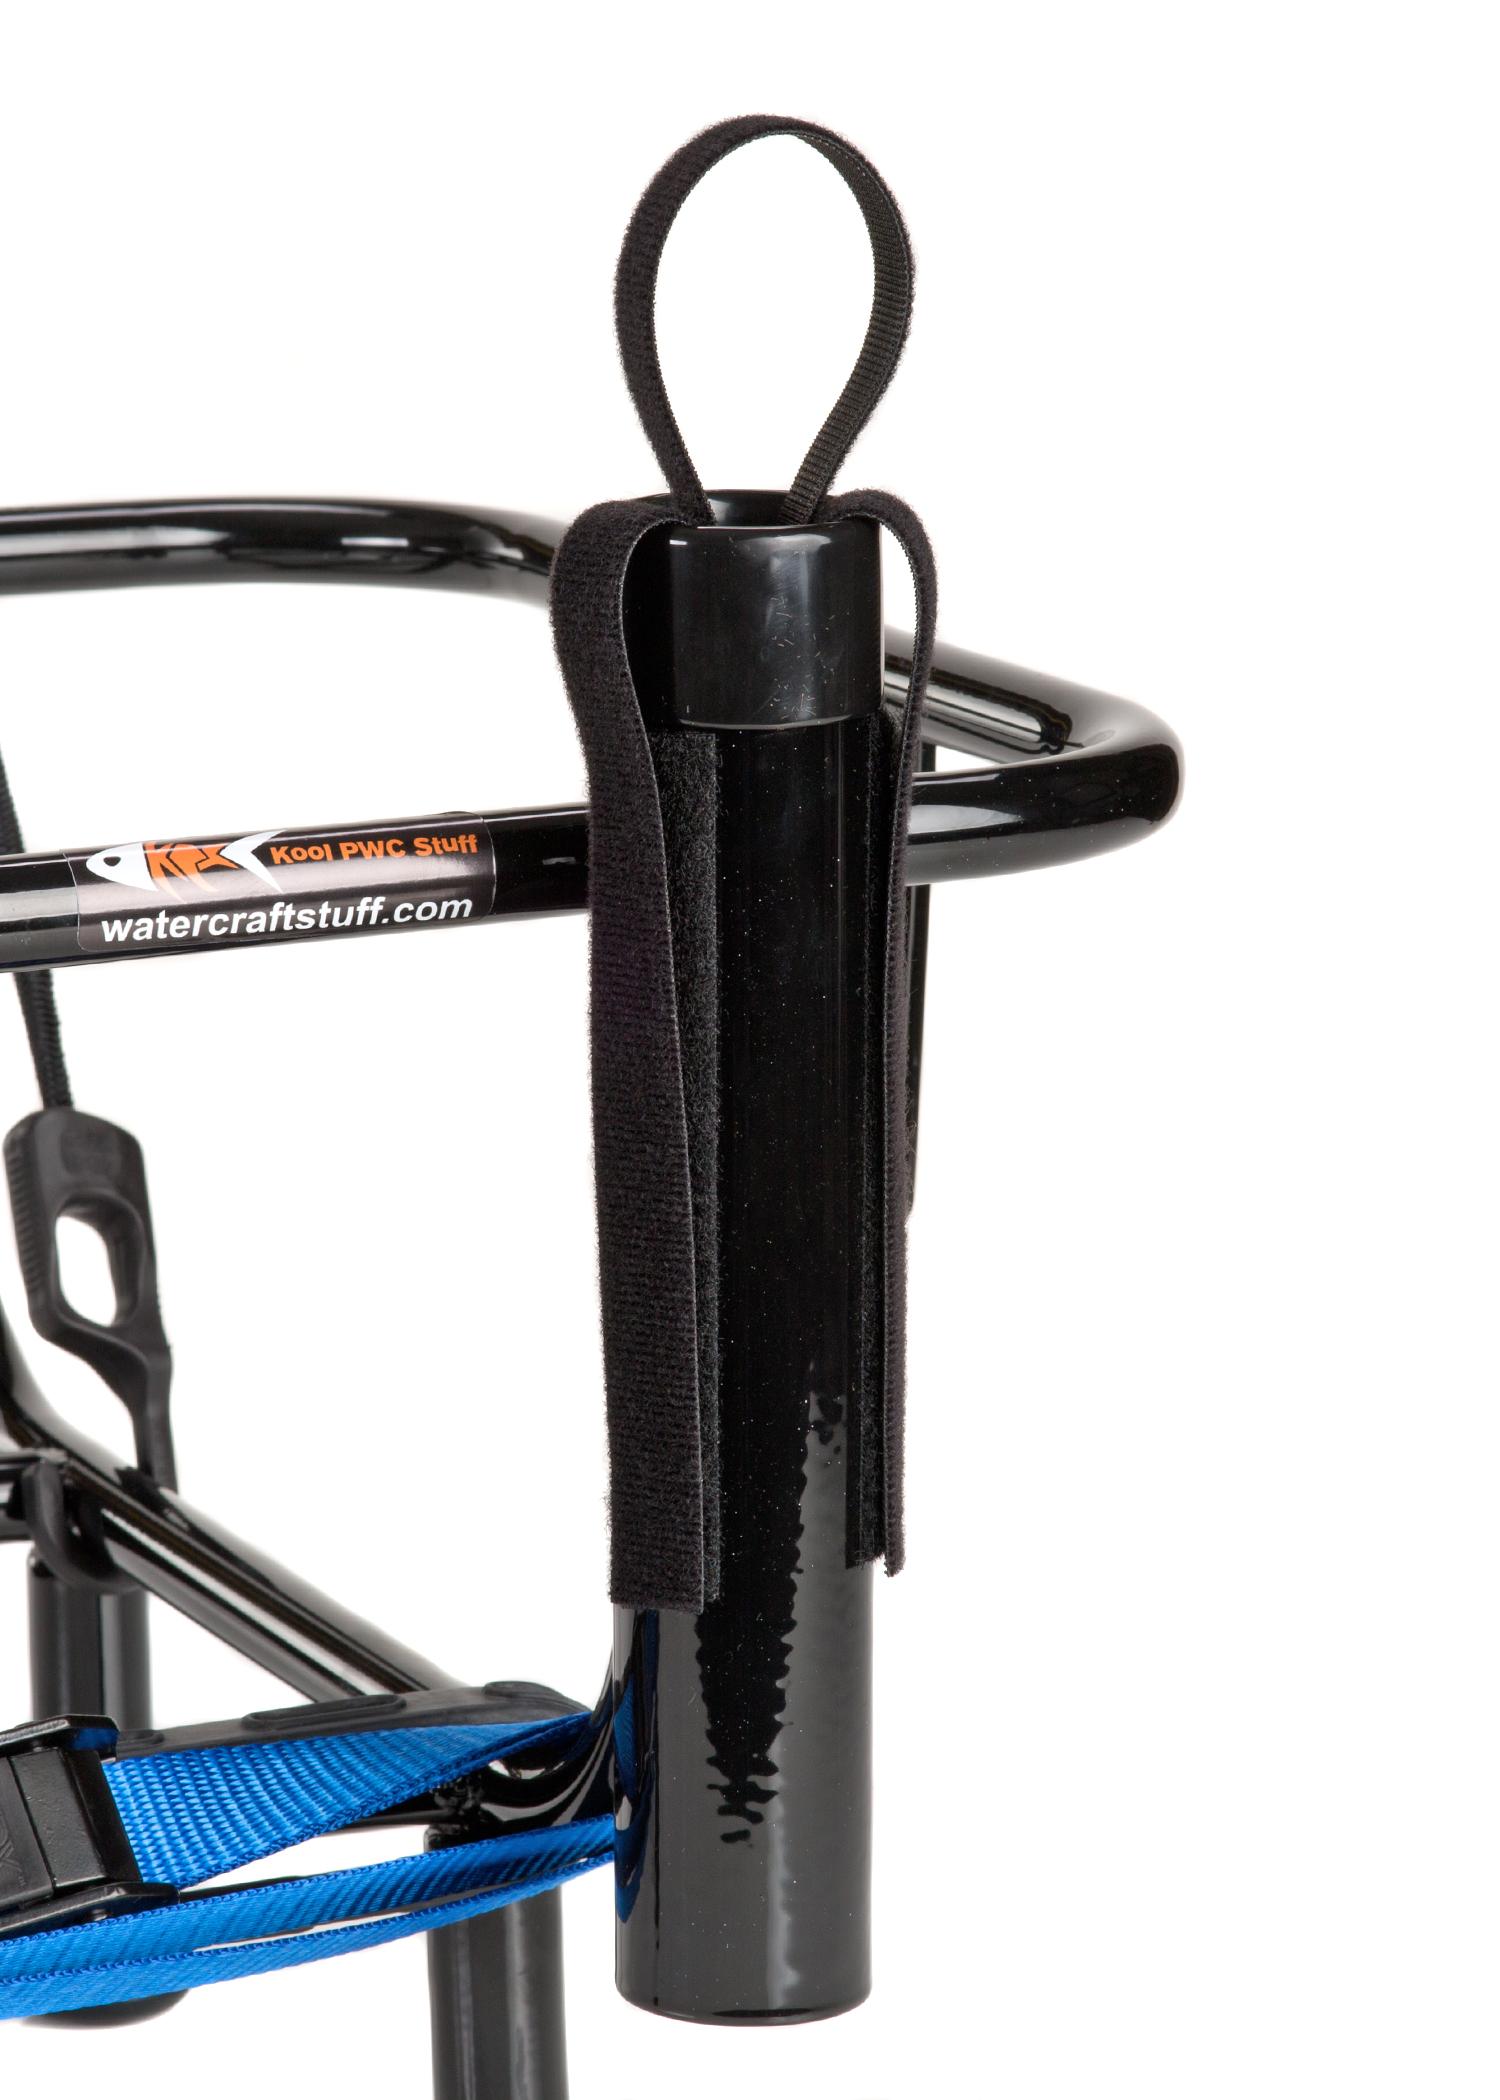 Jetski fishing rack with 4 rod holders kool pwc for Fishing rod organizer